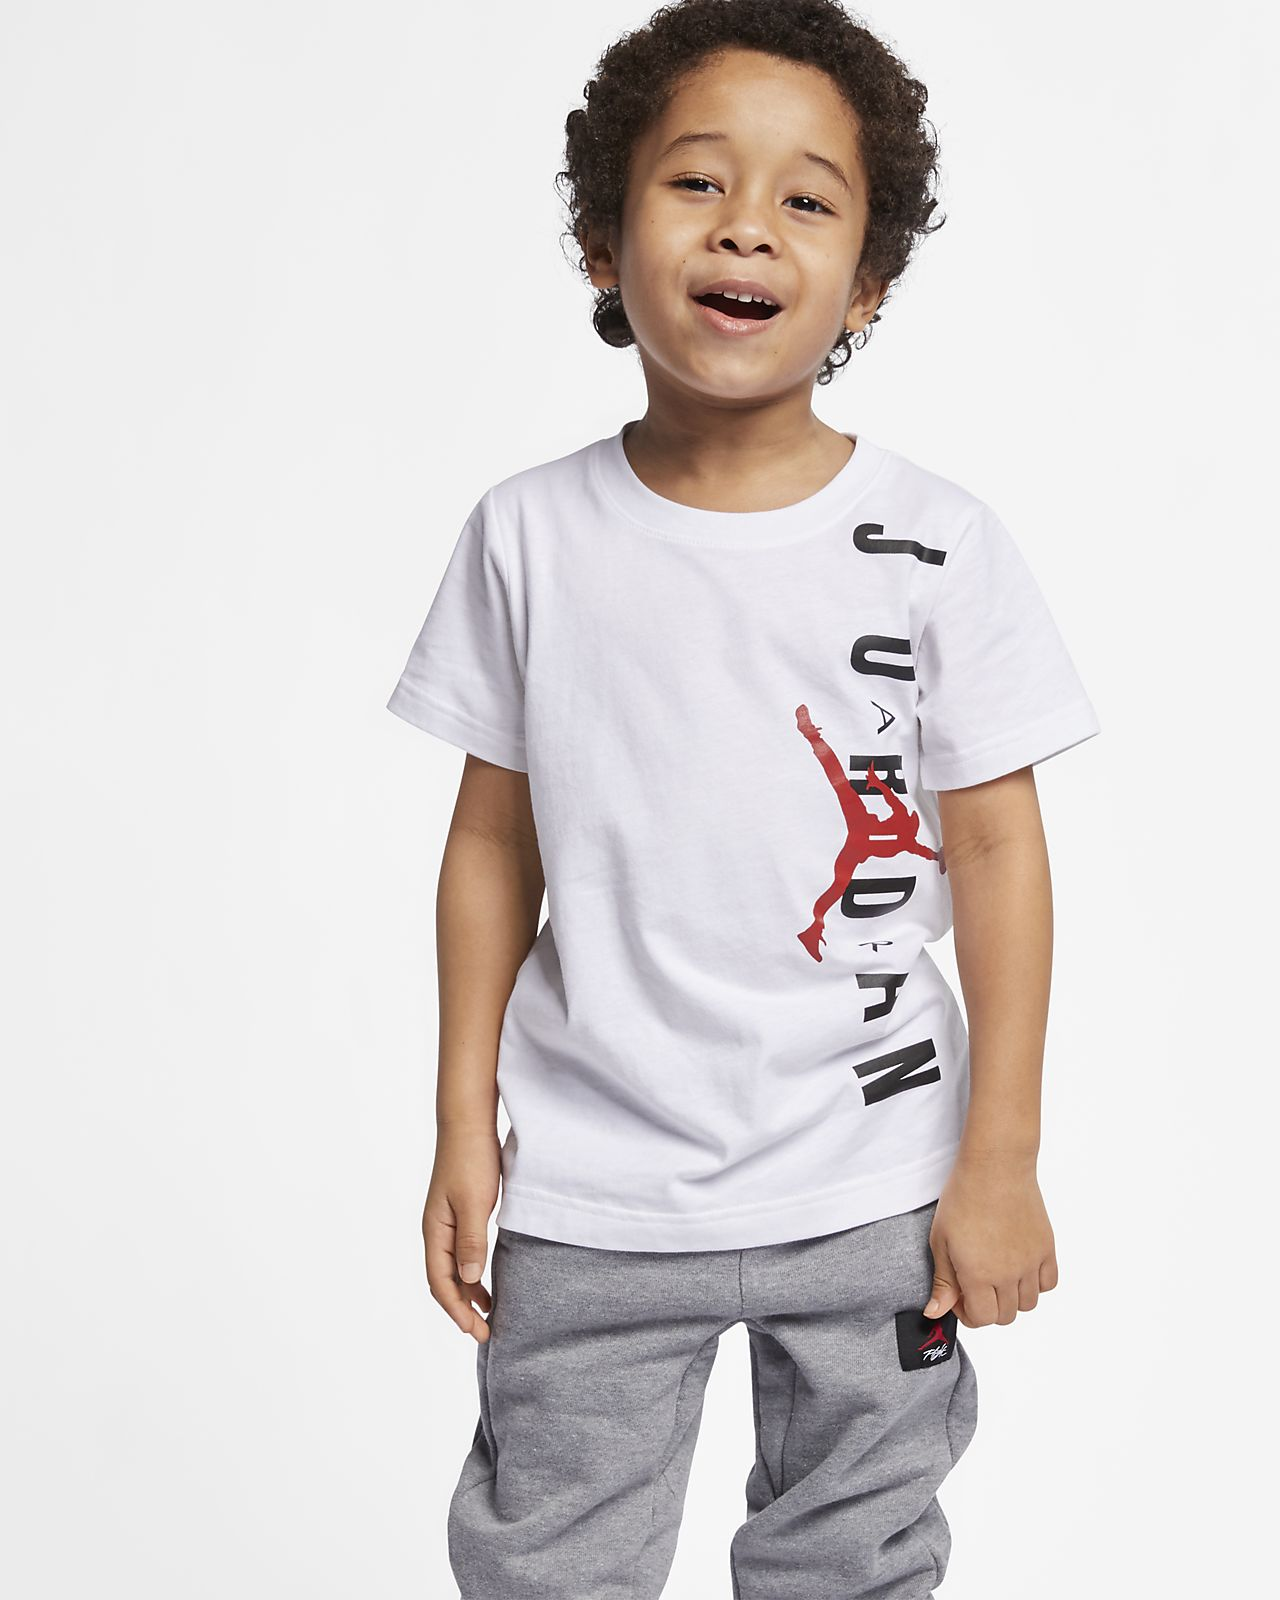 5510e4b10c Jordan Jumpman Air Camiseta - Niño a pequeño a. Nike.com ES